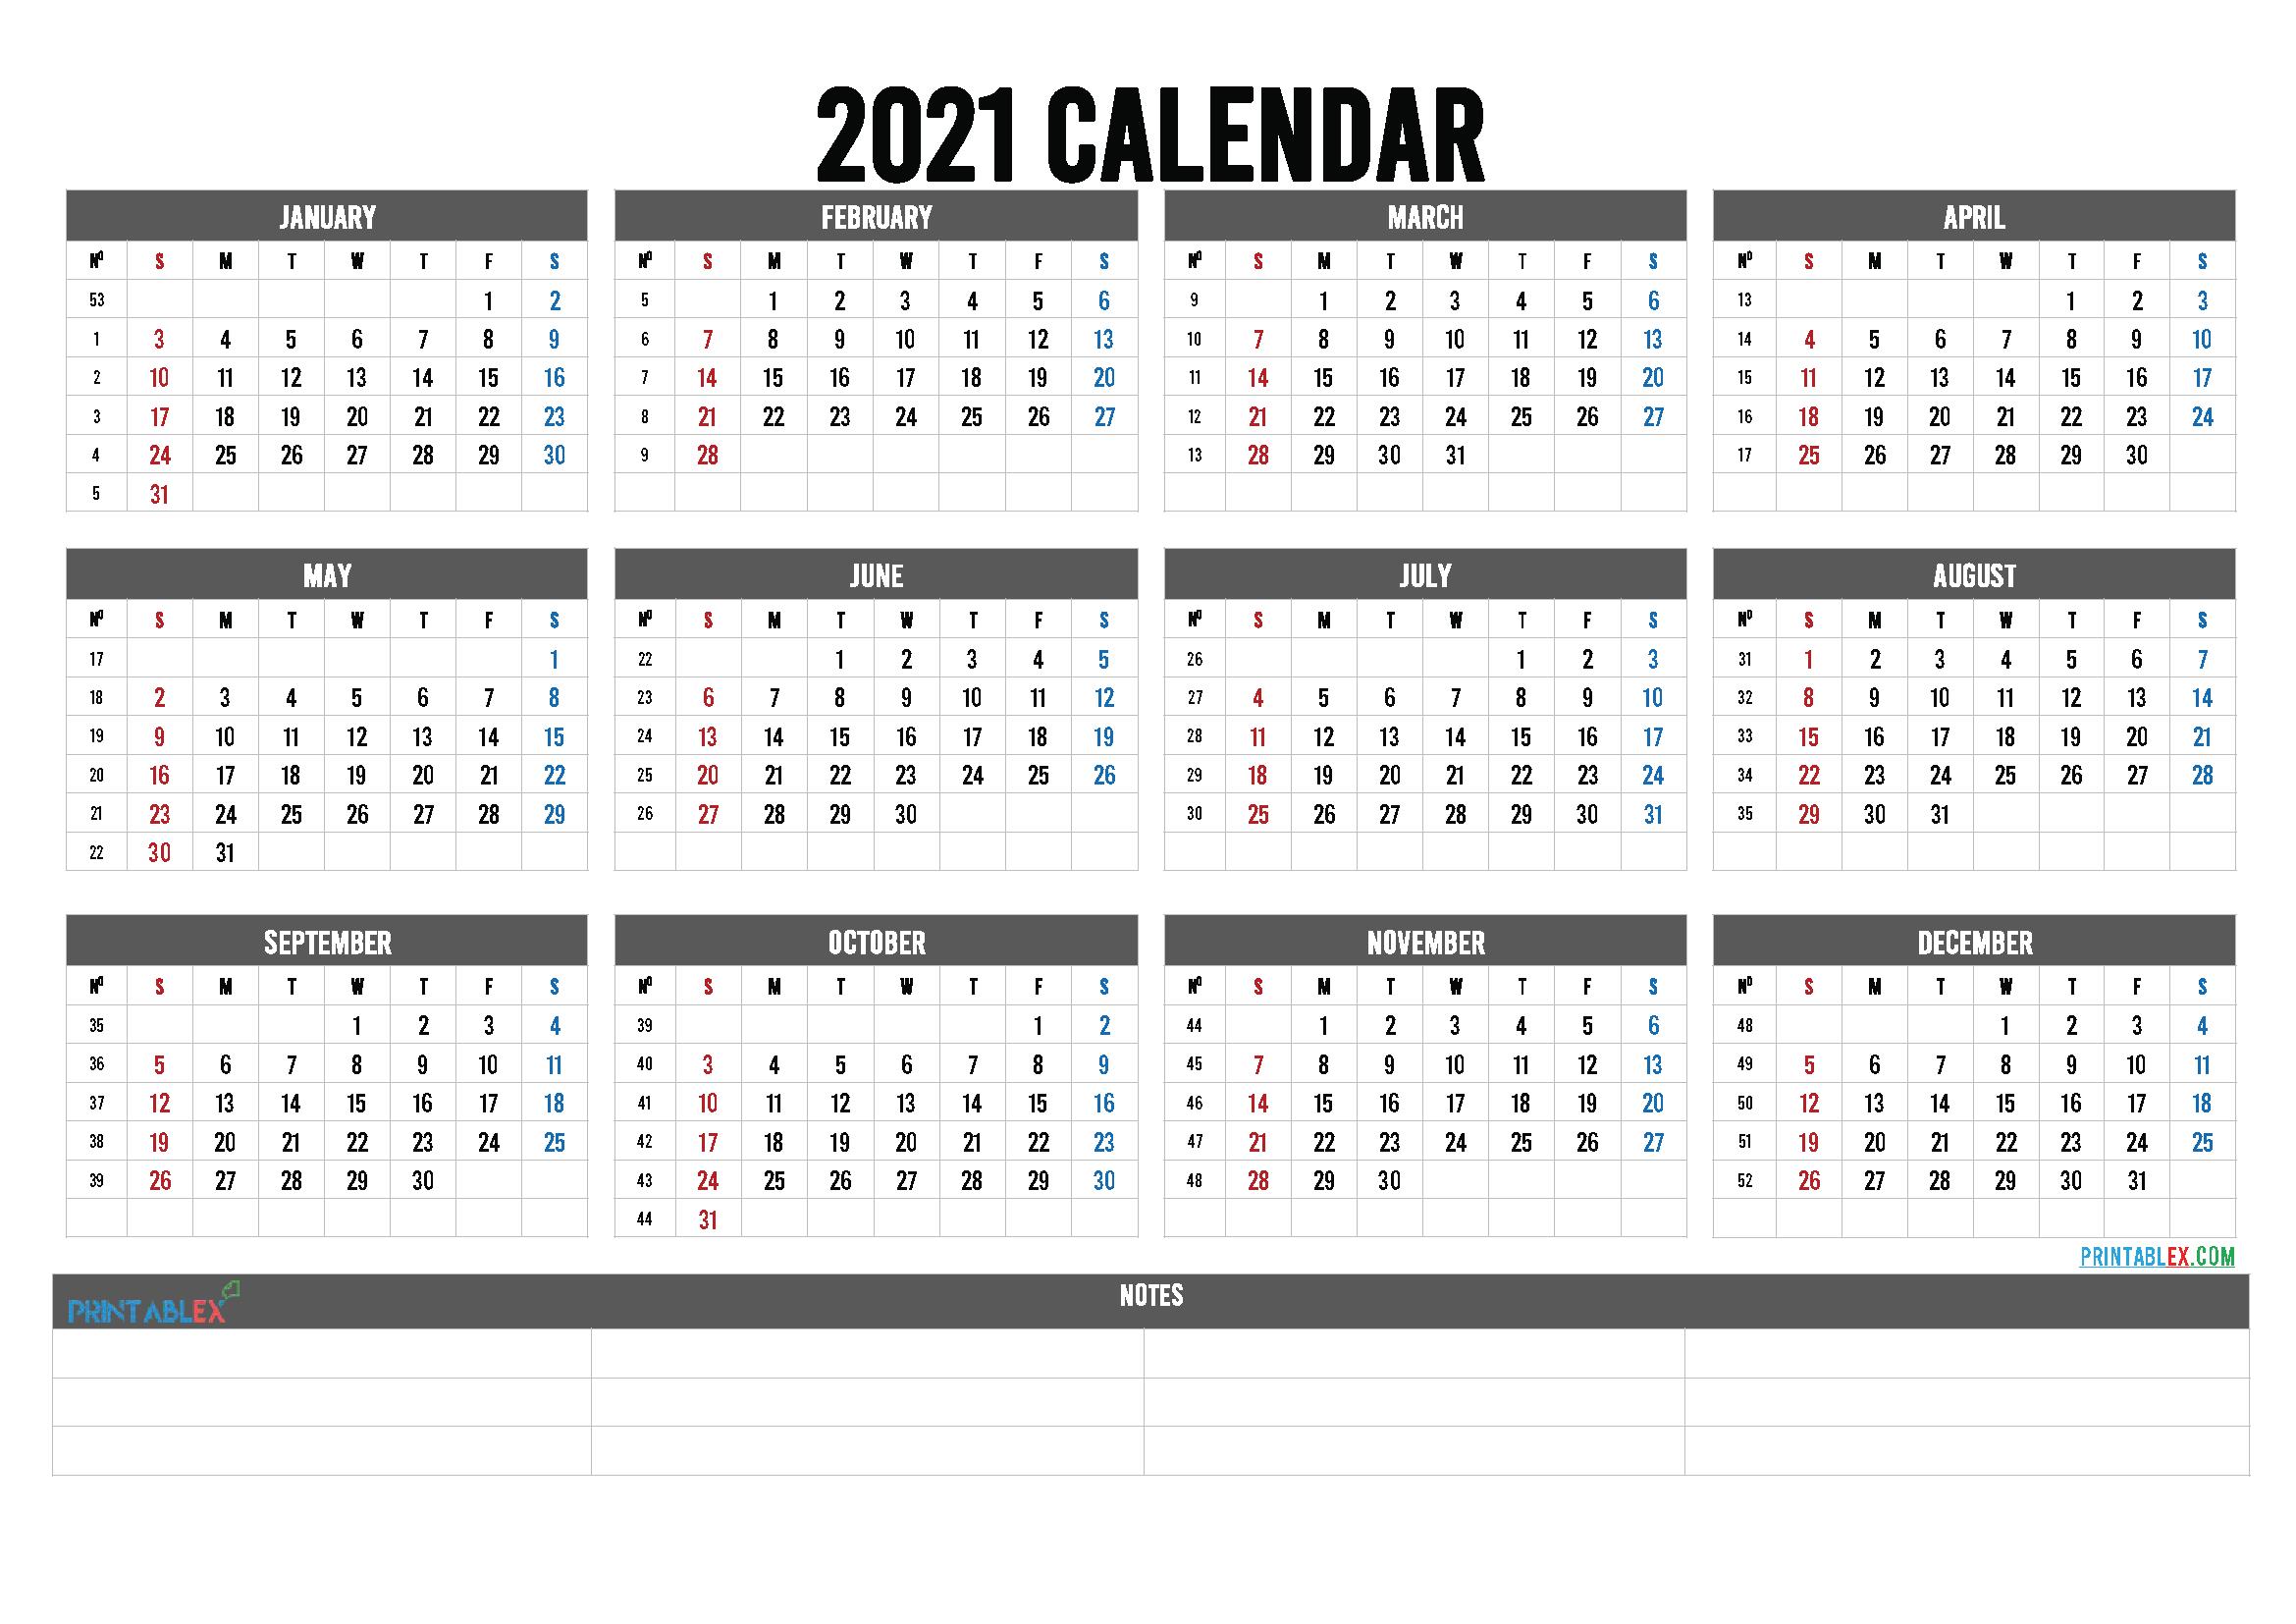 2021 Calendar With Week Numbers Printable 21ytw145 In 2020 Calendar Printables Printable Calendar Template Printable Yearly Calendar